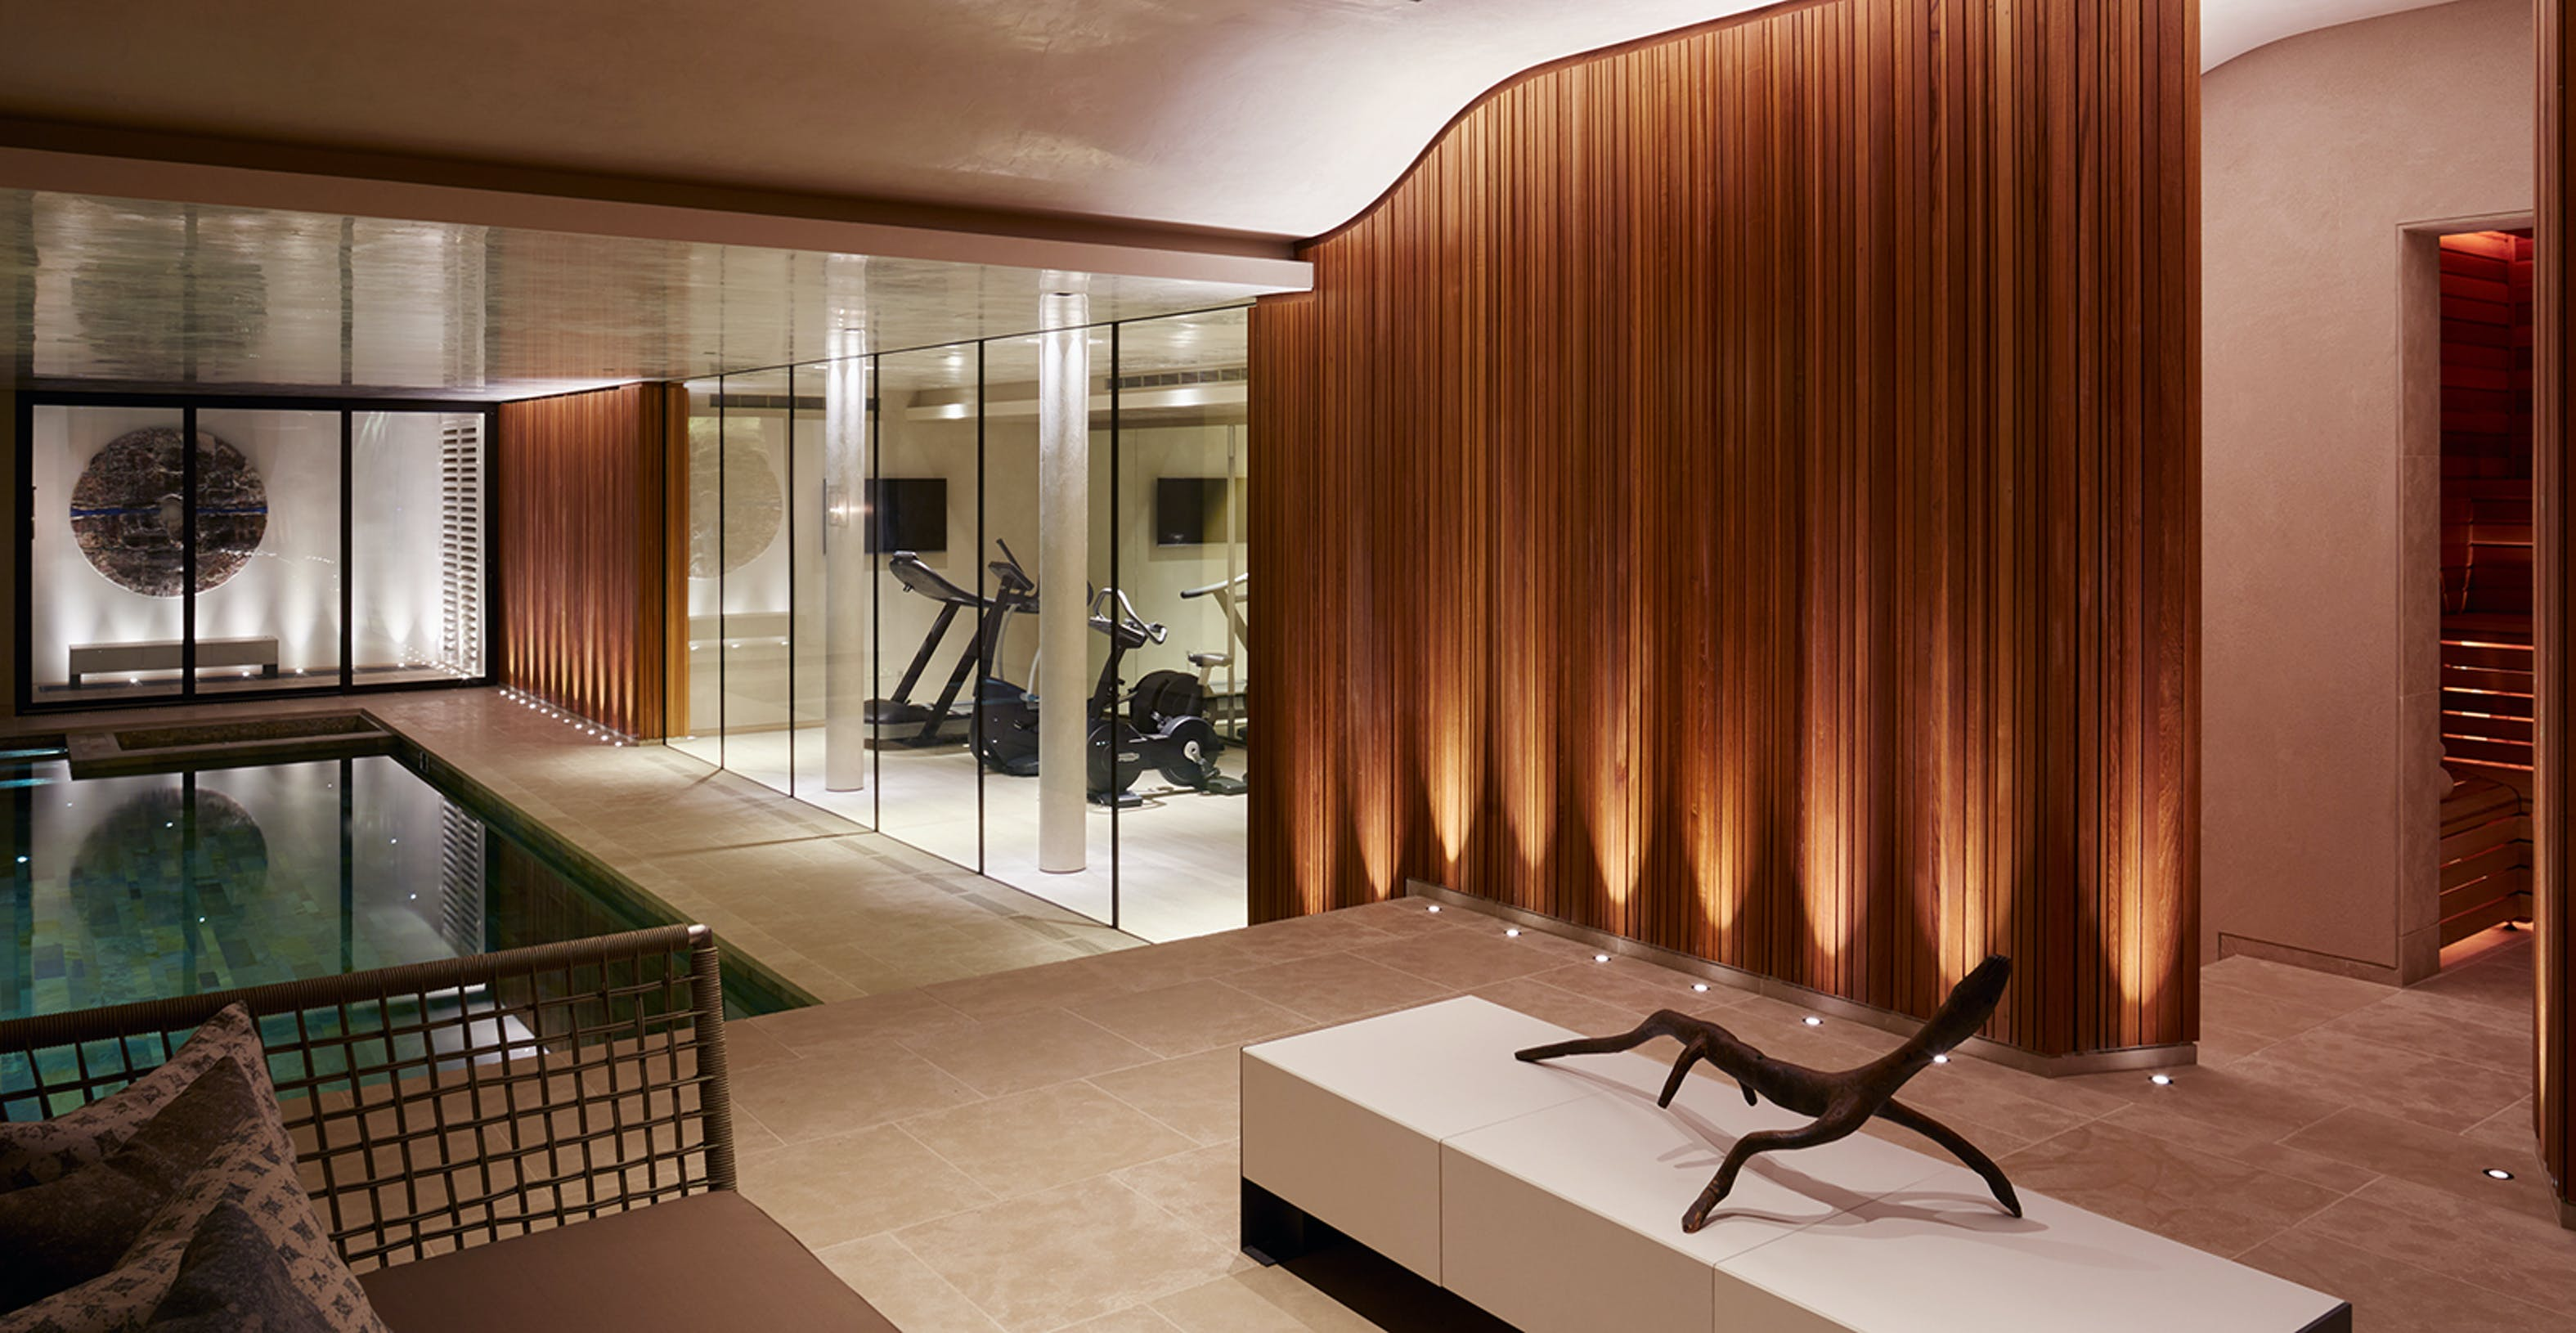 basement sauna and gym